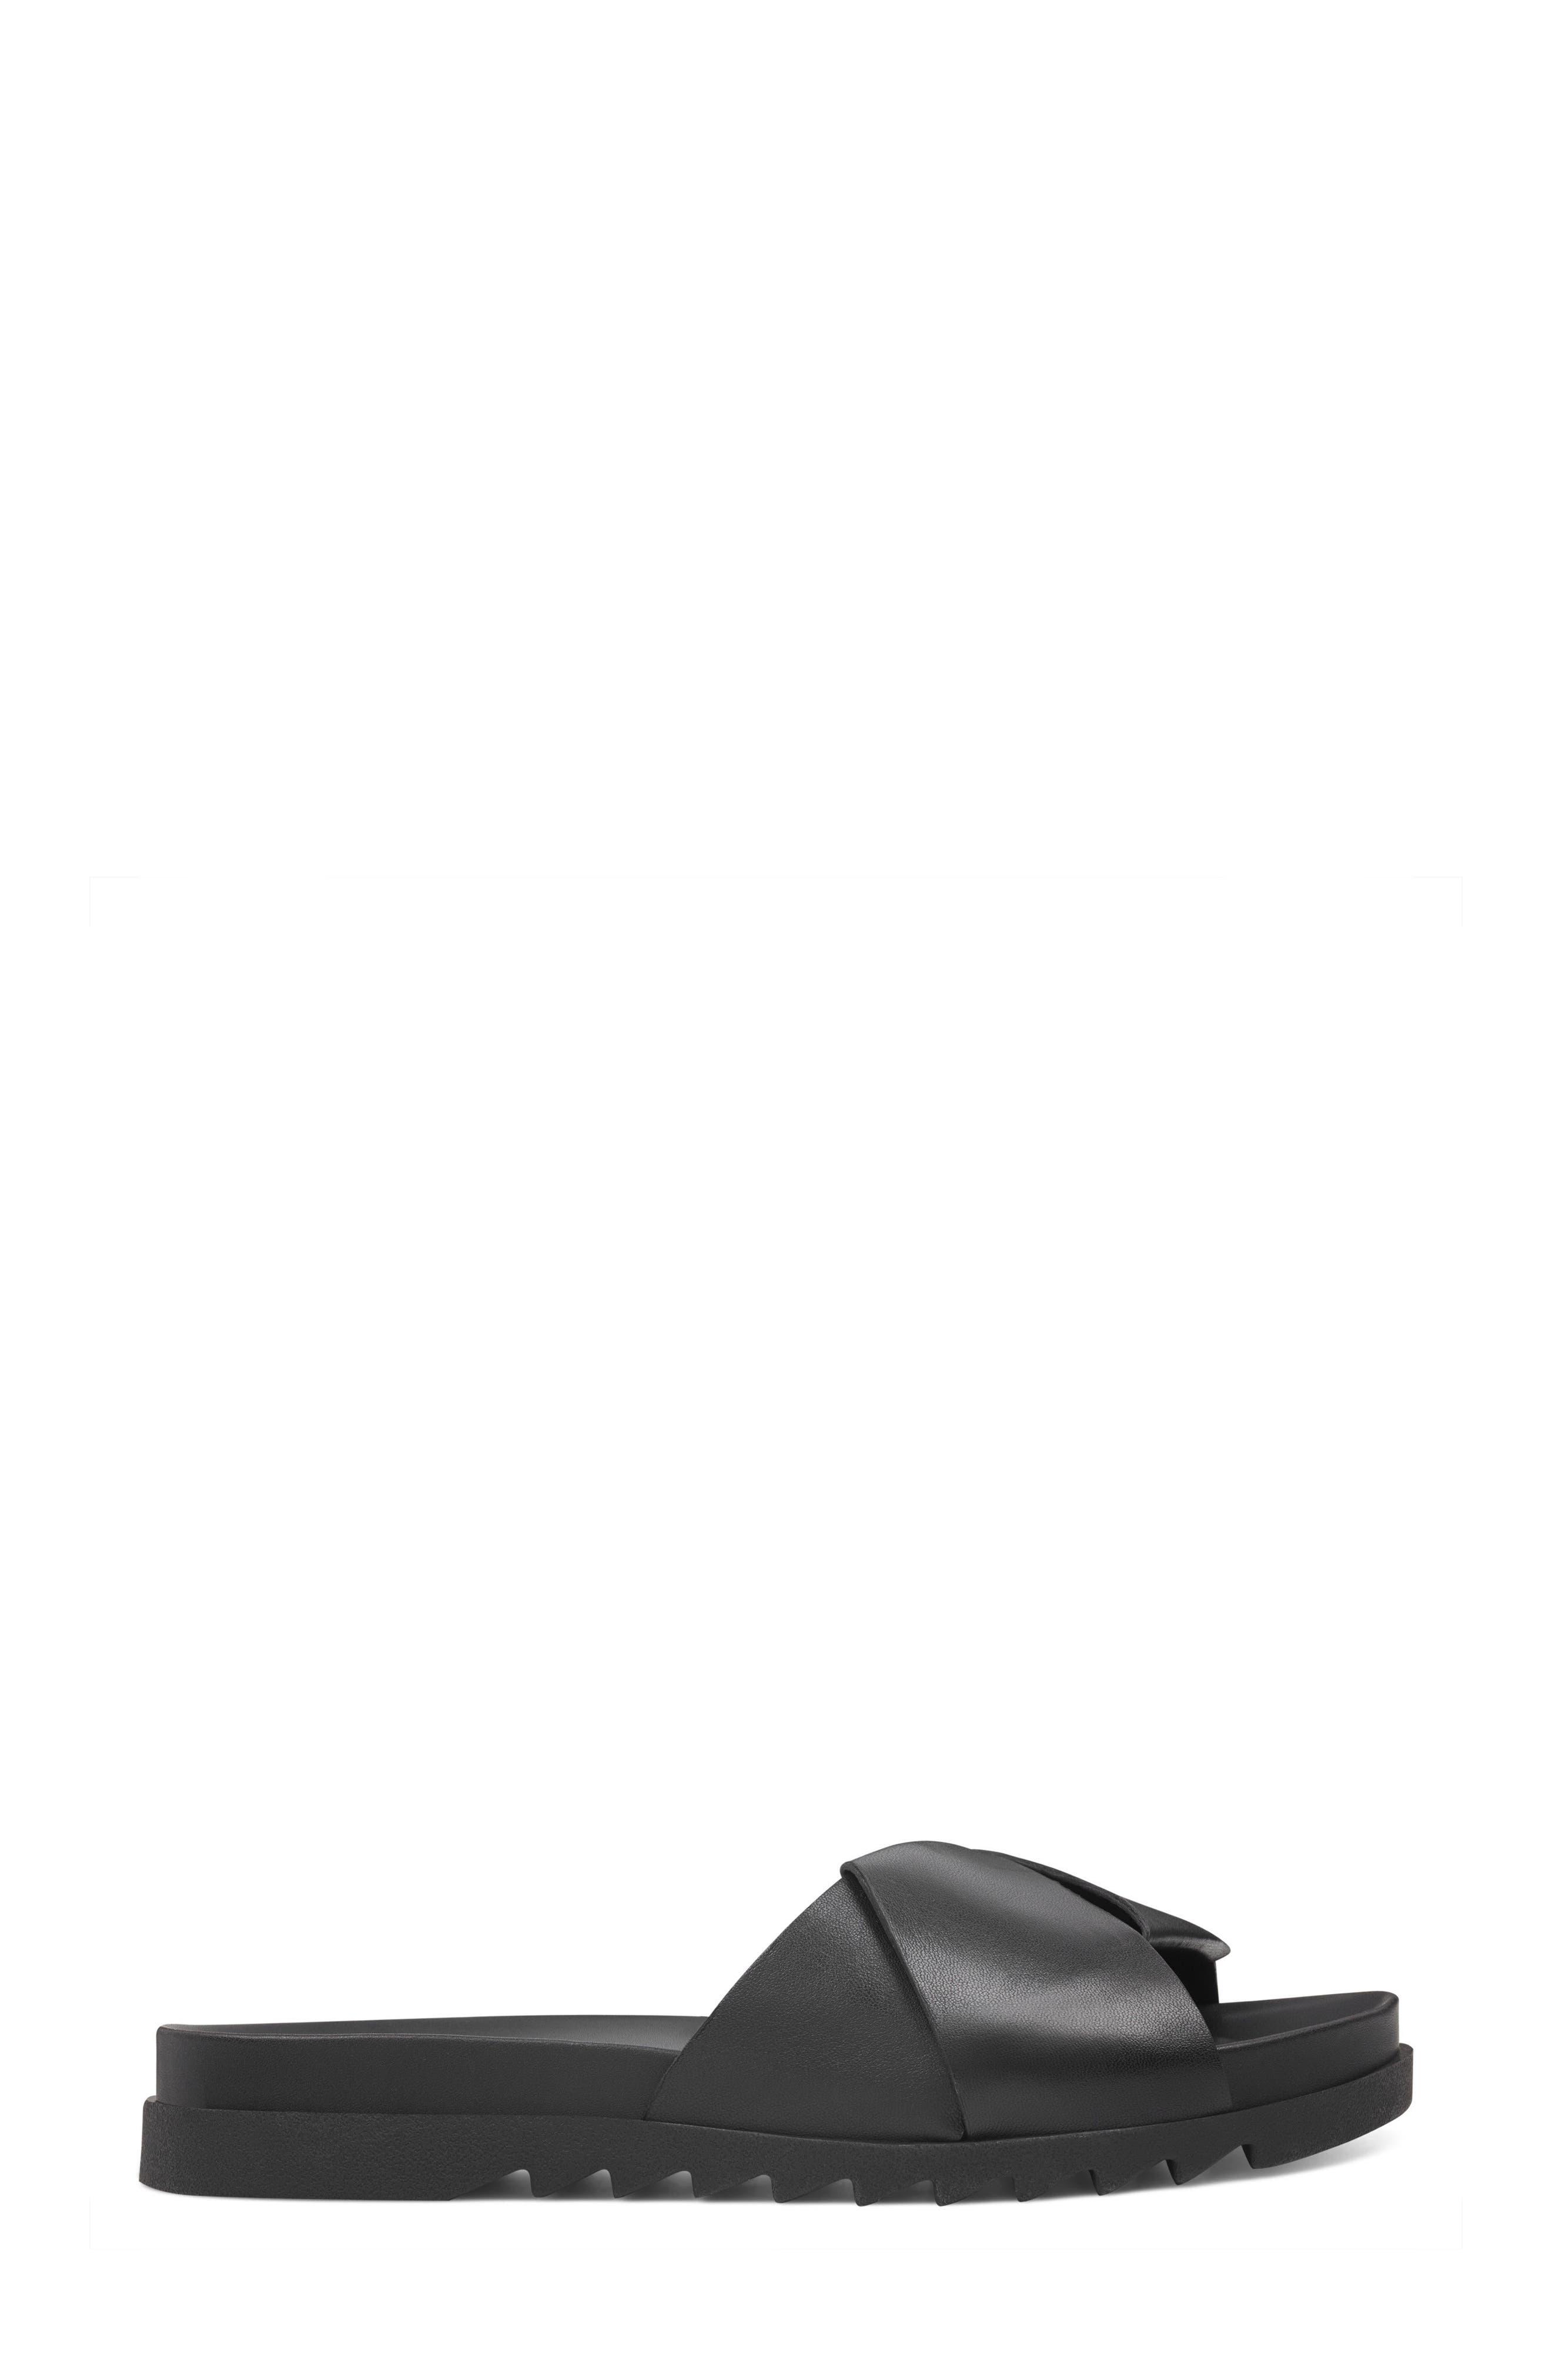 Furaish Slide Sandal,                             Alternate thumbnail 3, color,                             001